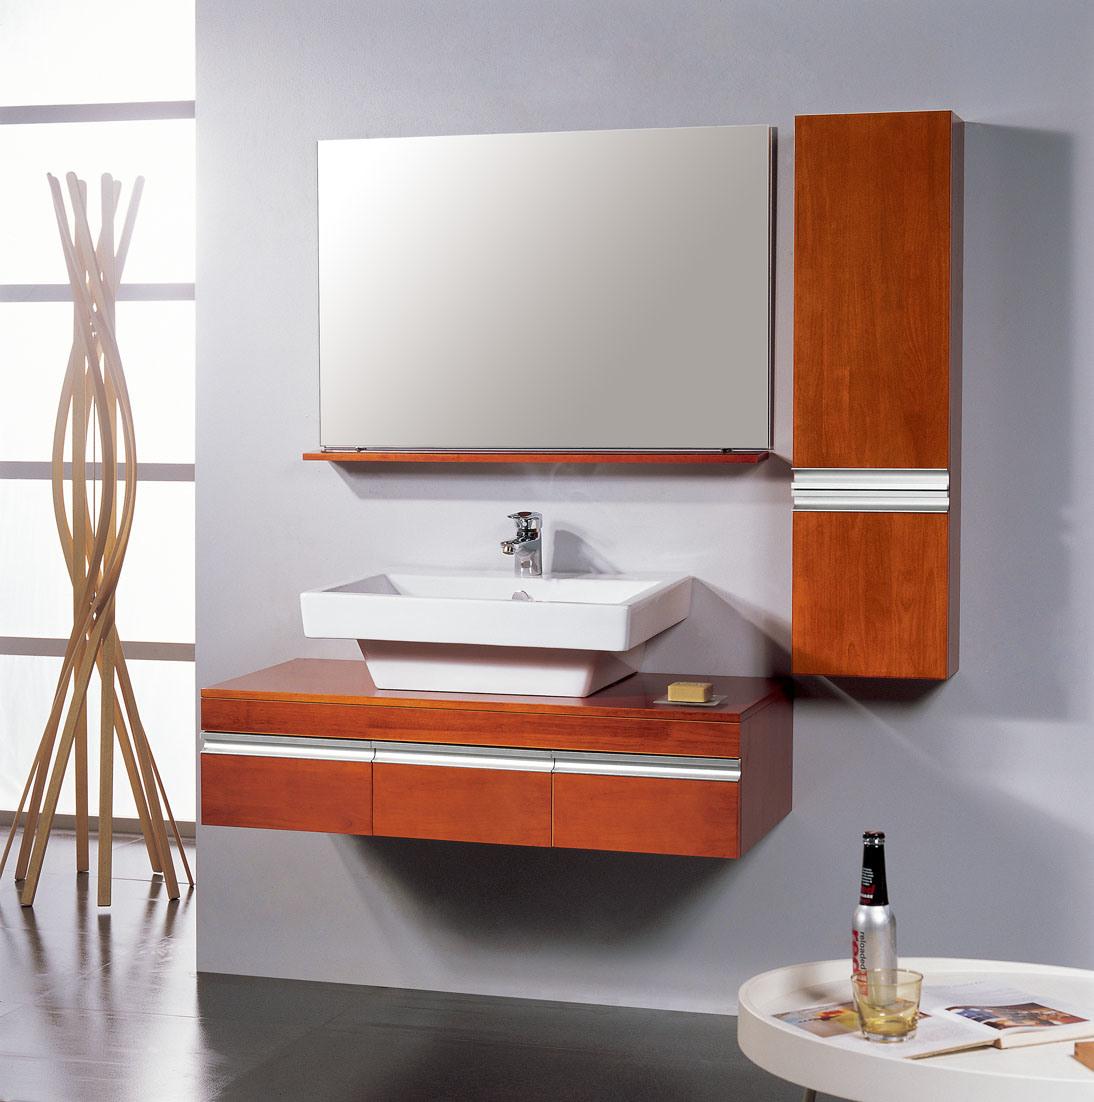 Muebles habitacion madera 20170816050759 for Habitacion madera